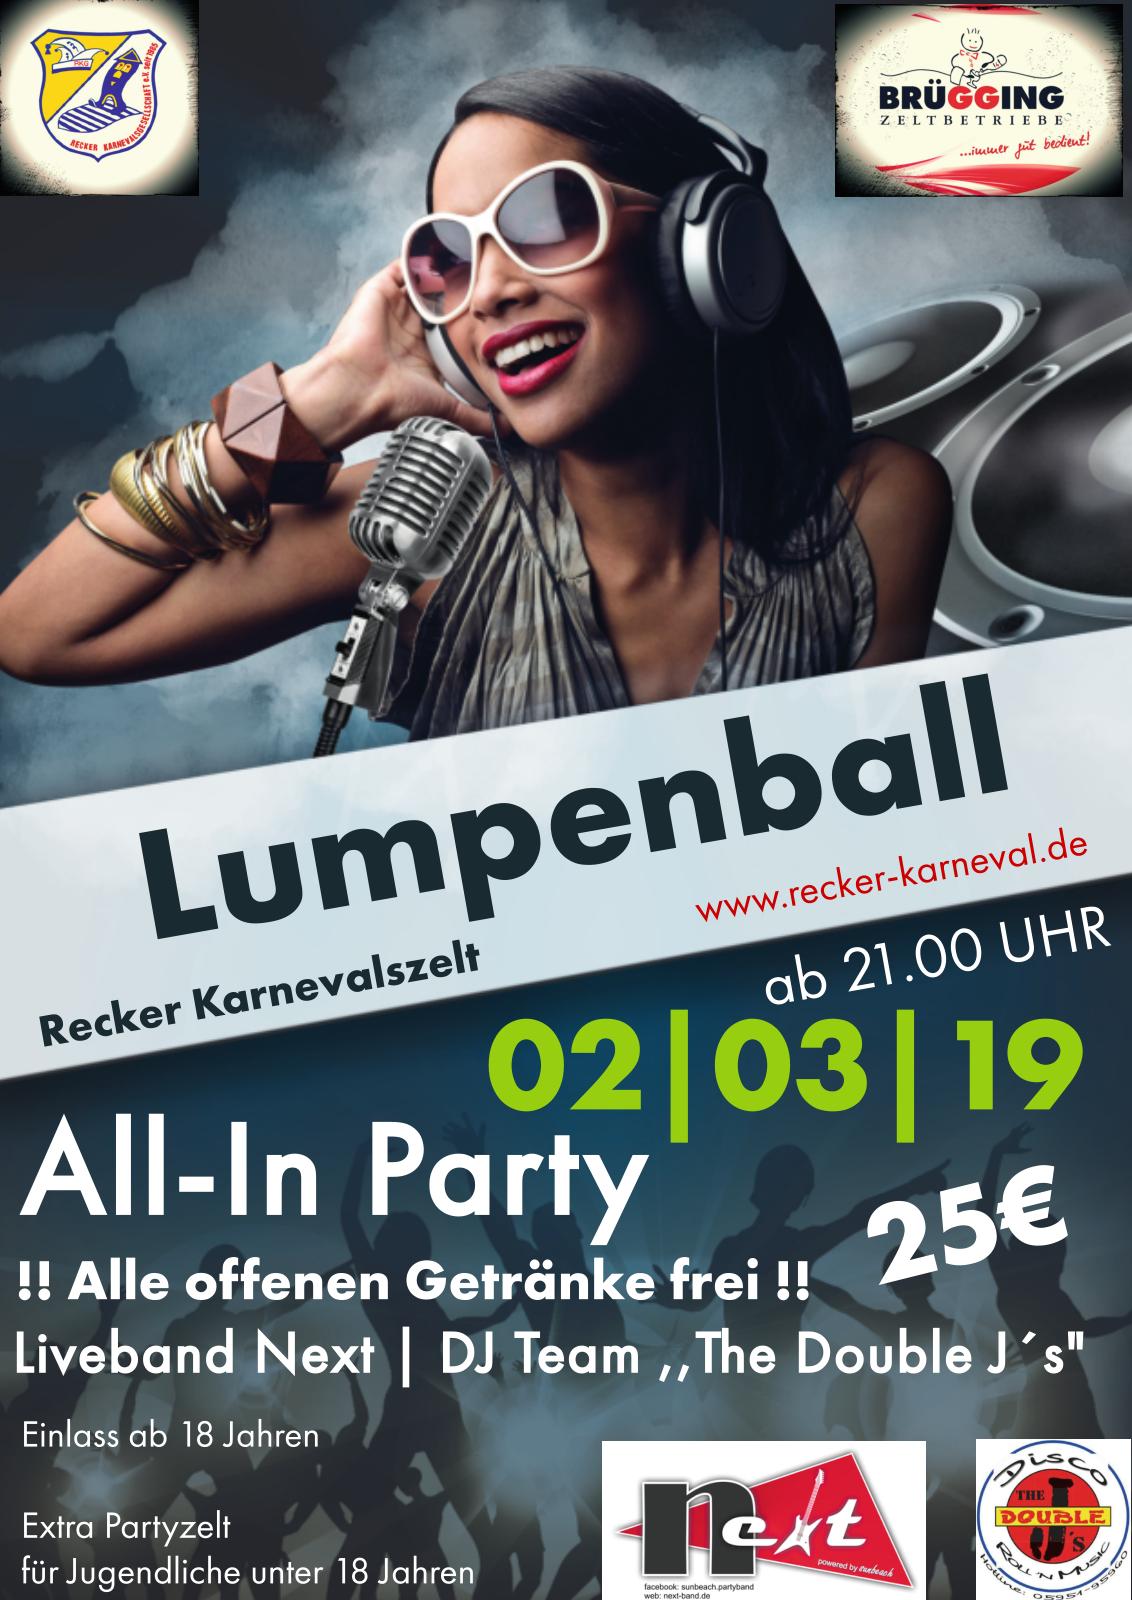 Lumnpenball 2019